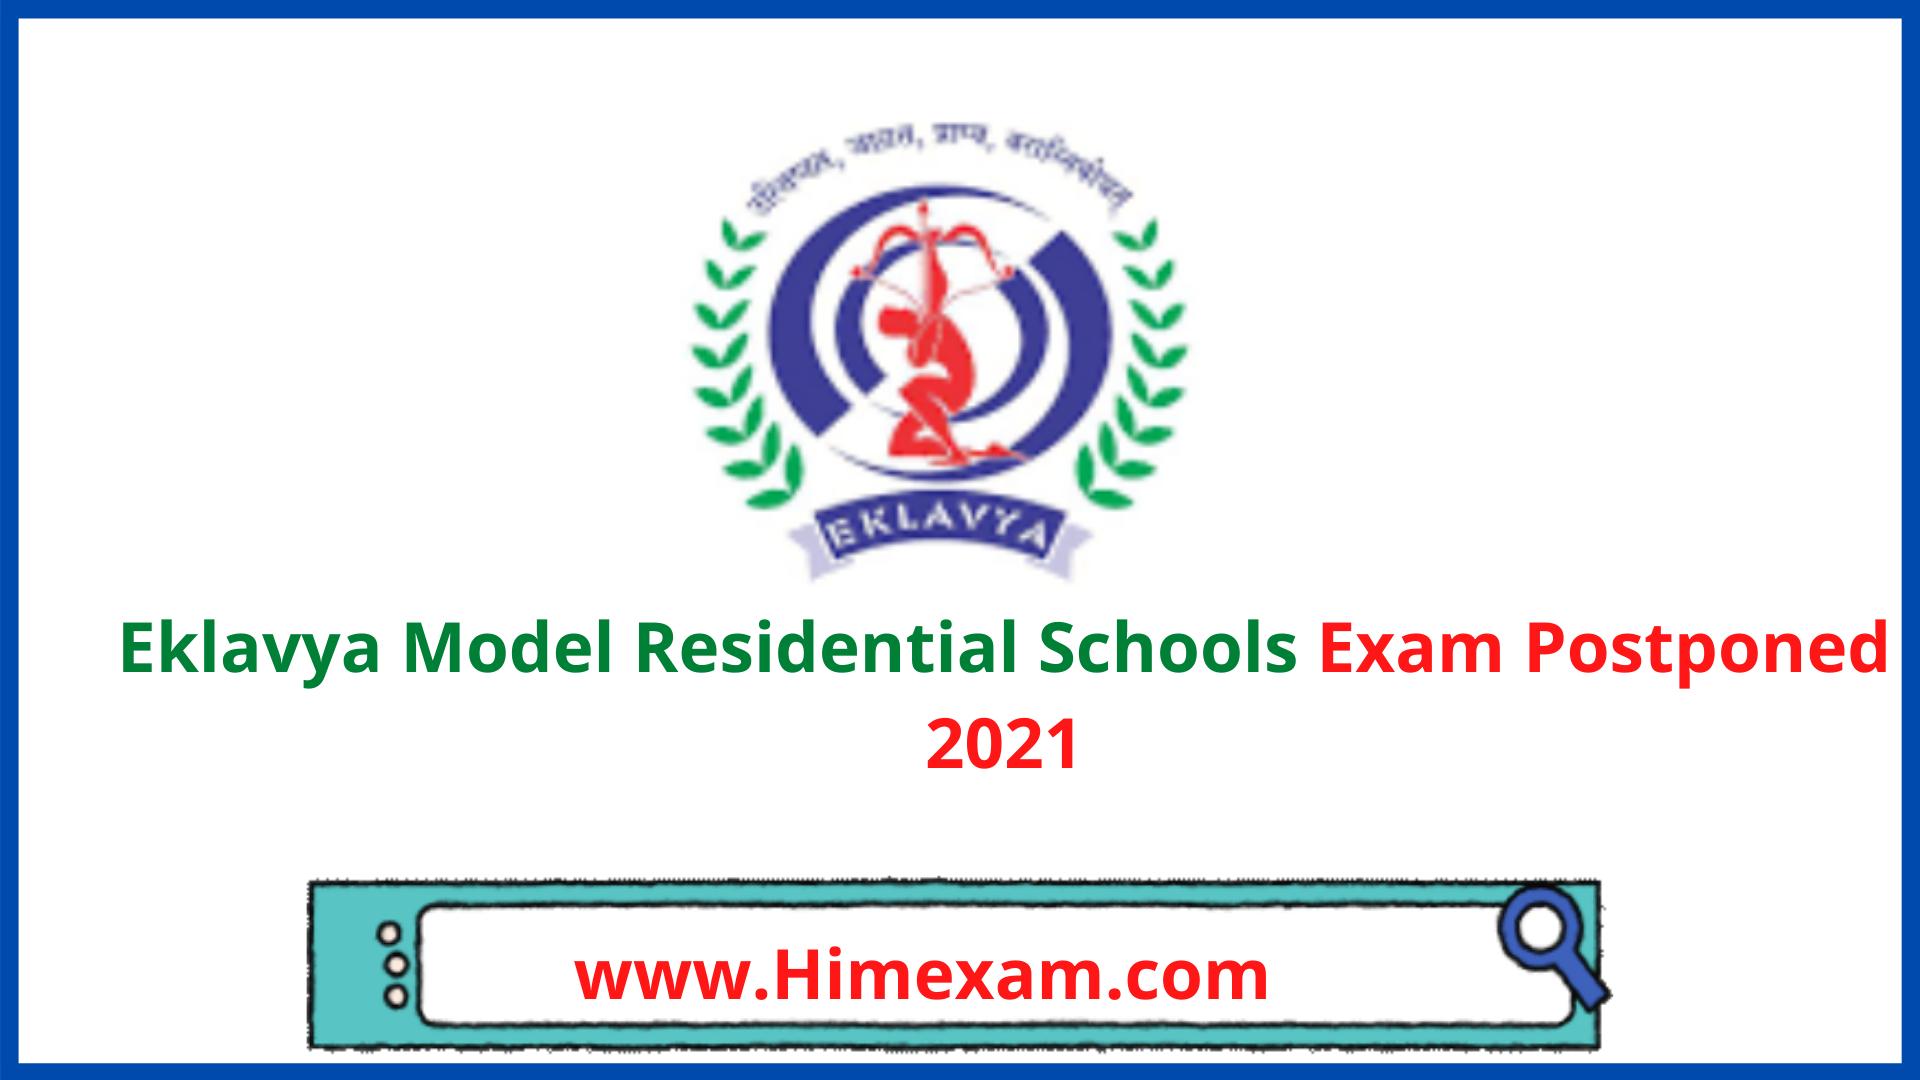 Eklavya Model Residential Schools Exam Postponed 2021